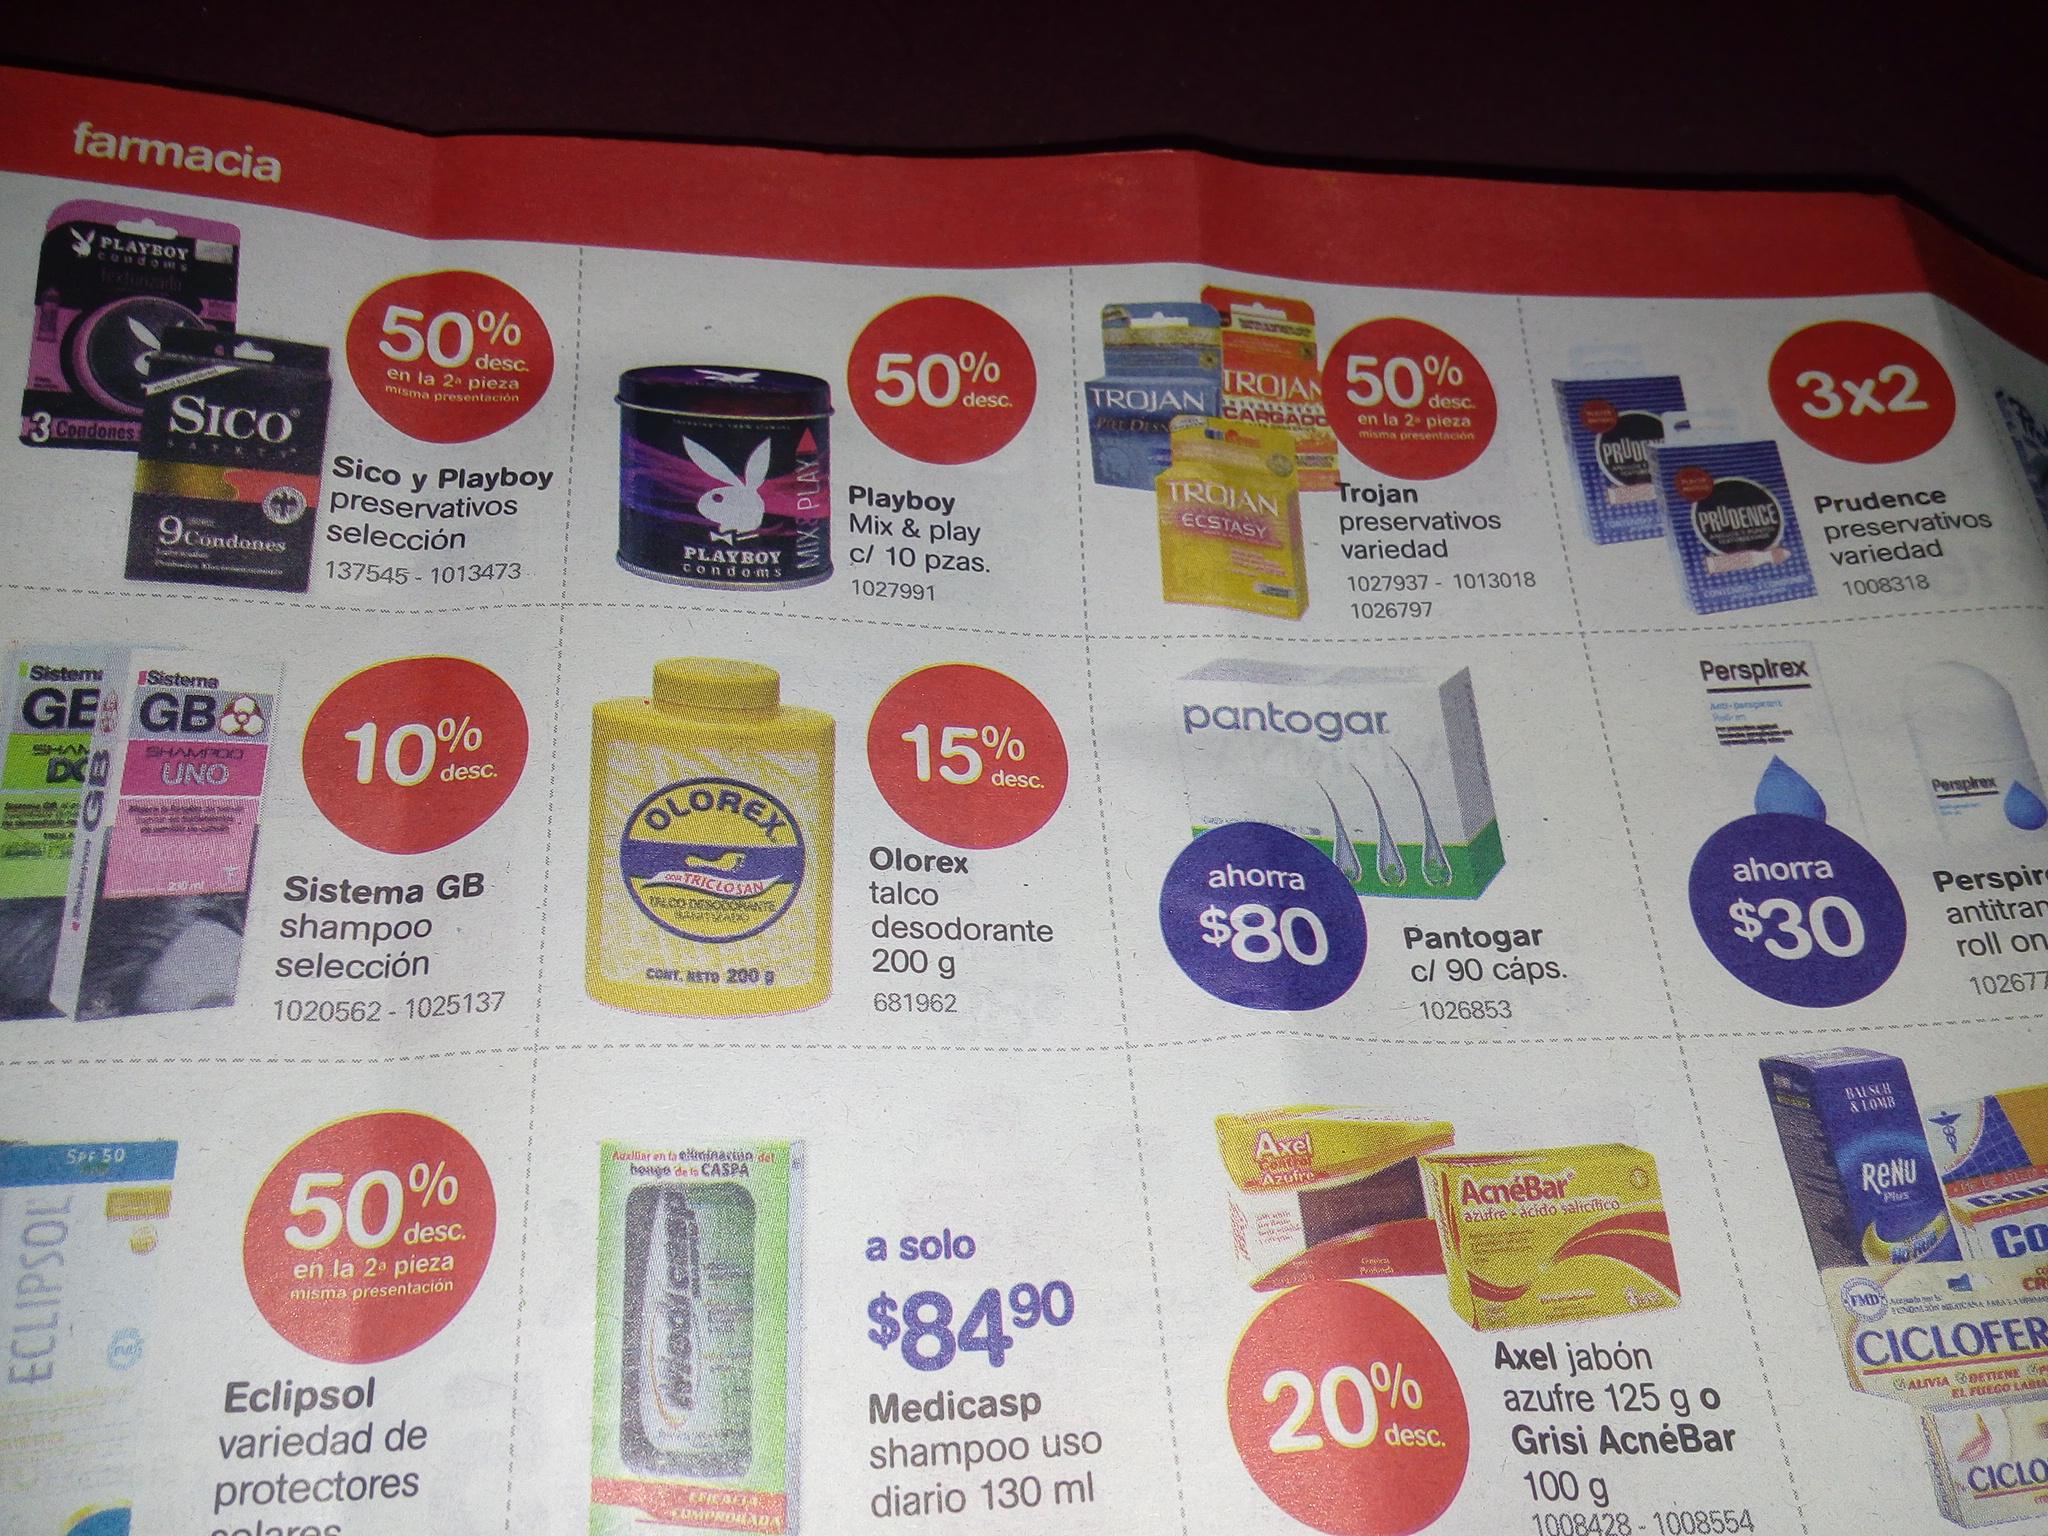 Farmacia Benavides: preservativos Playboy 50% de descuento